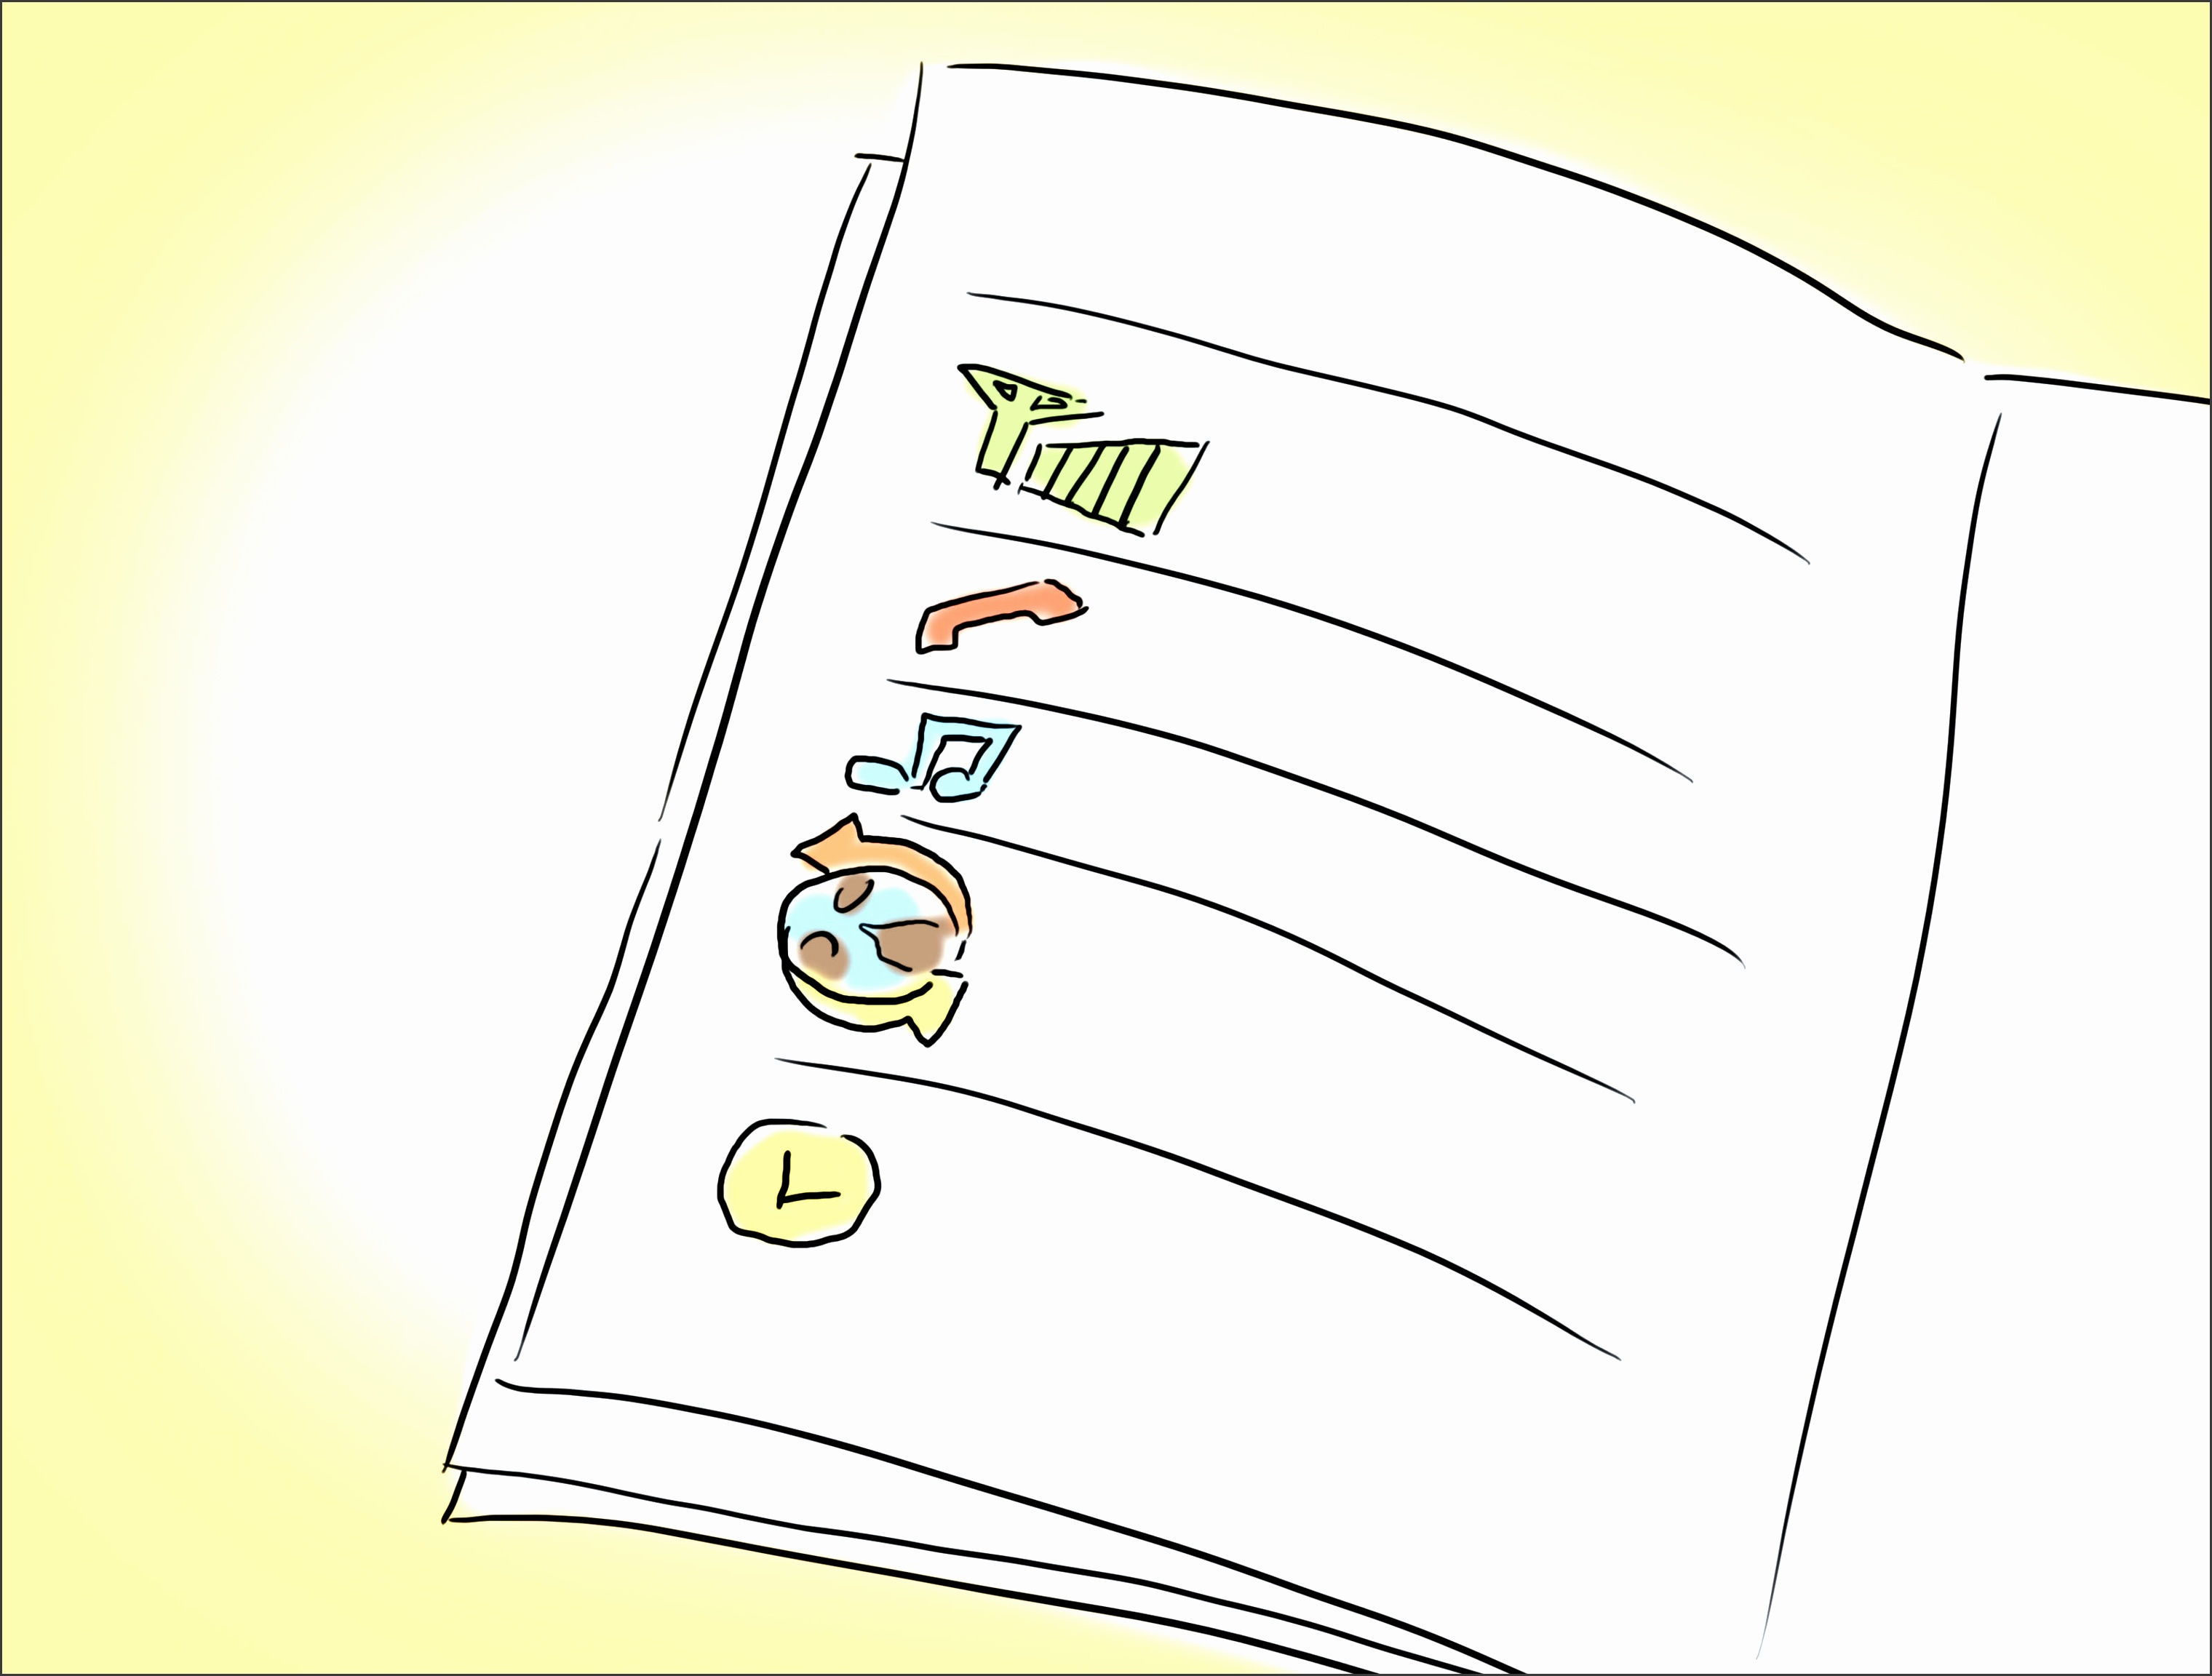 Instruction manual template Free creator